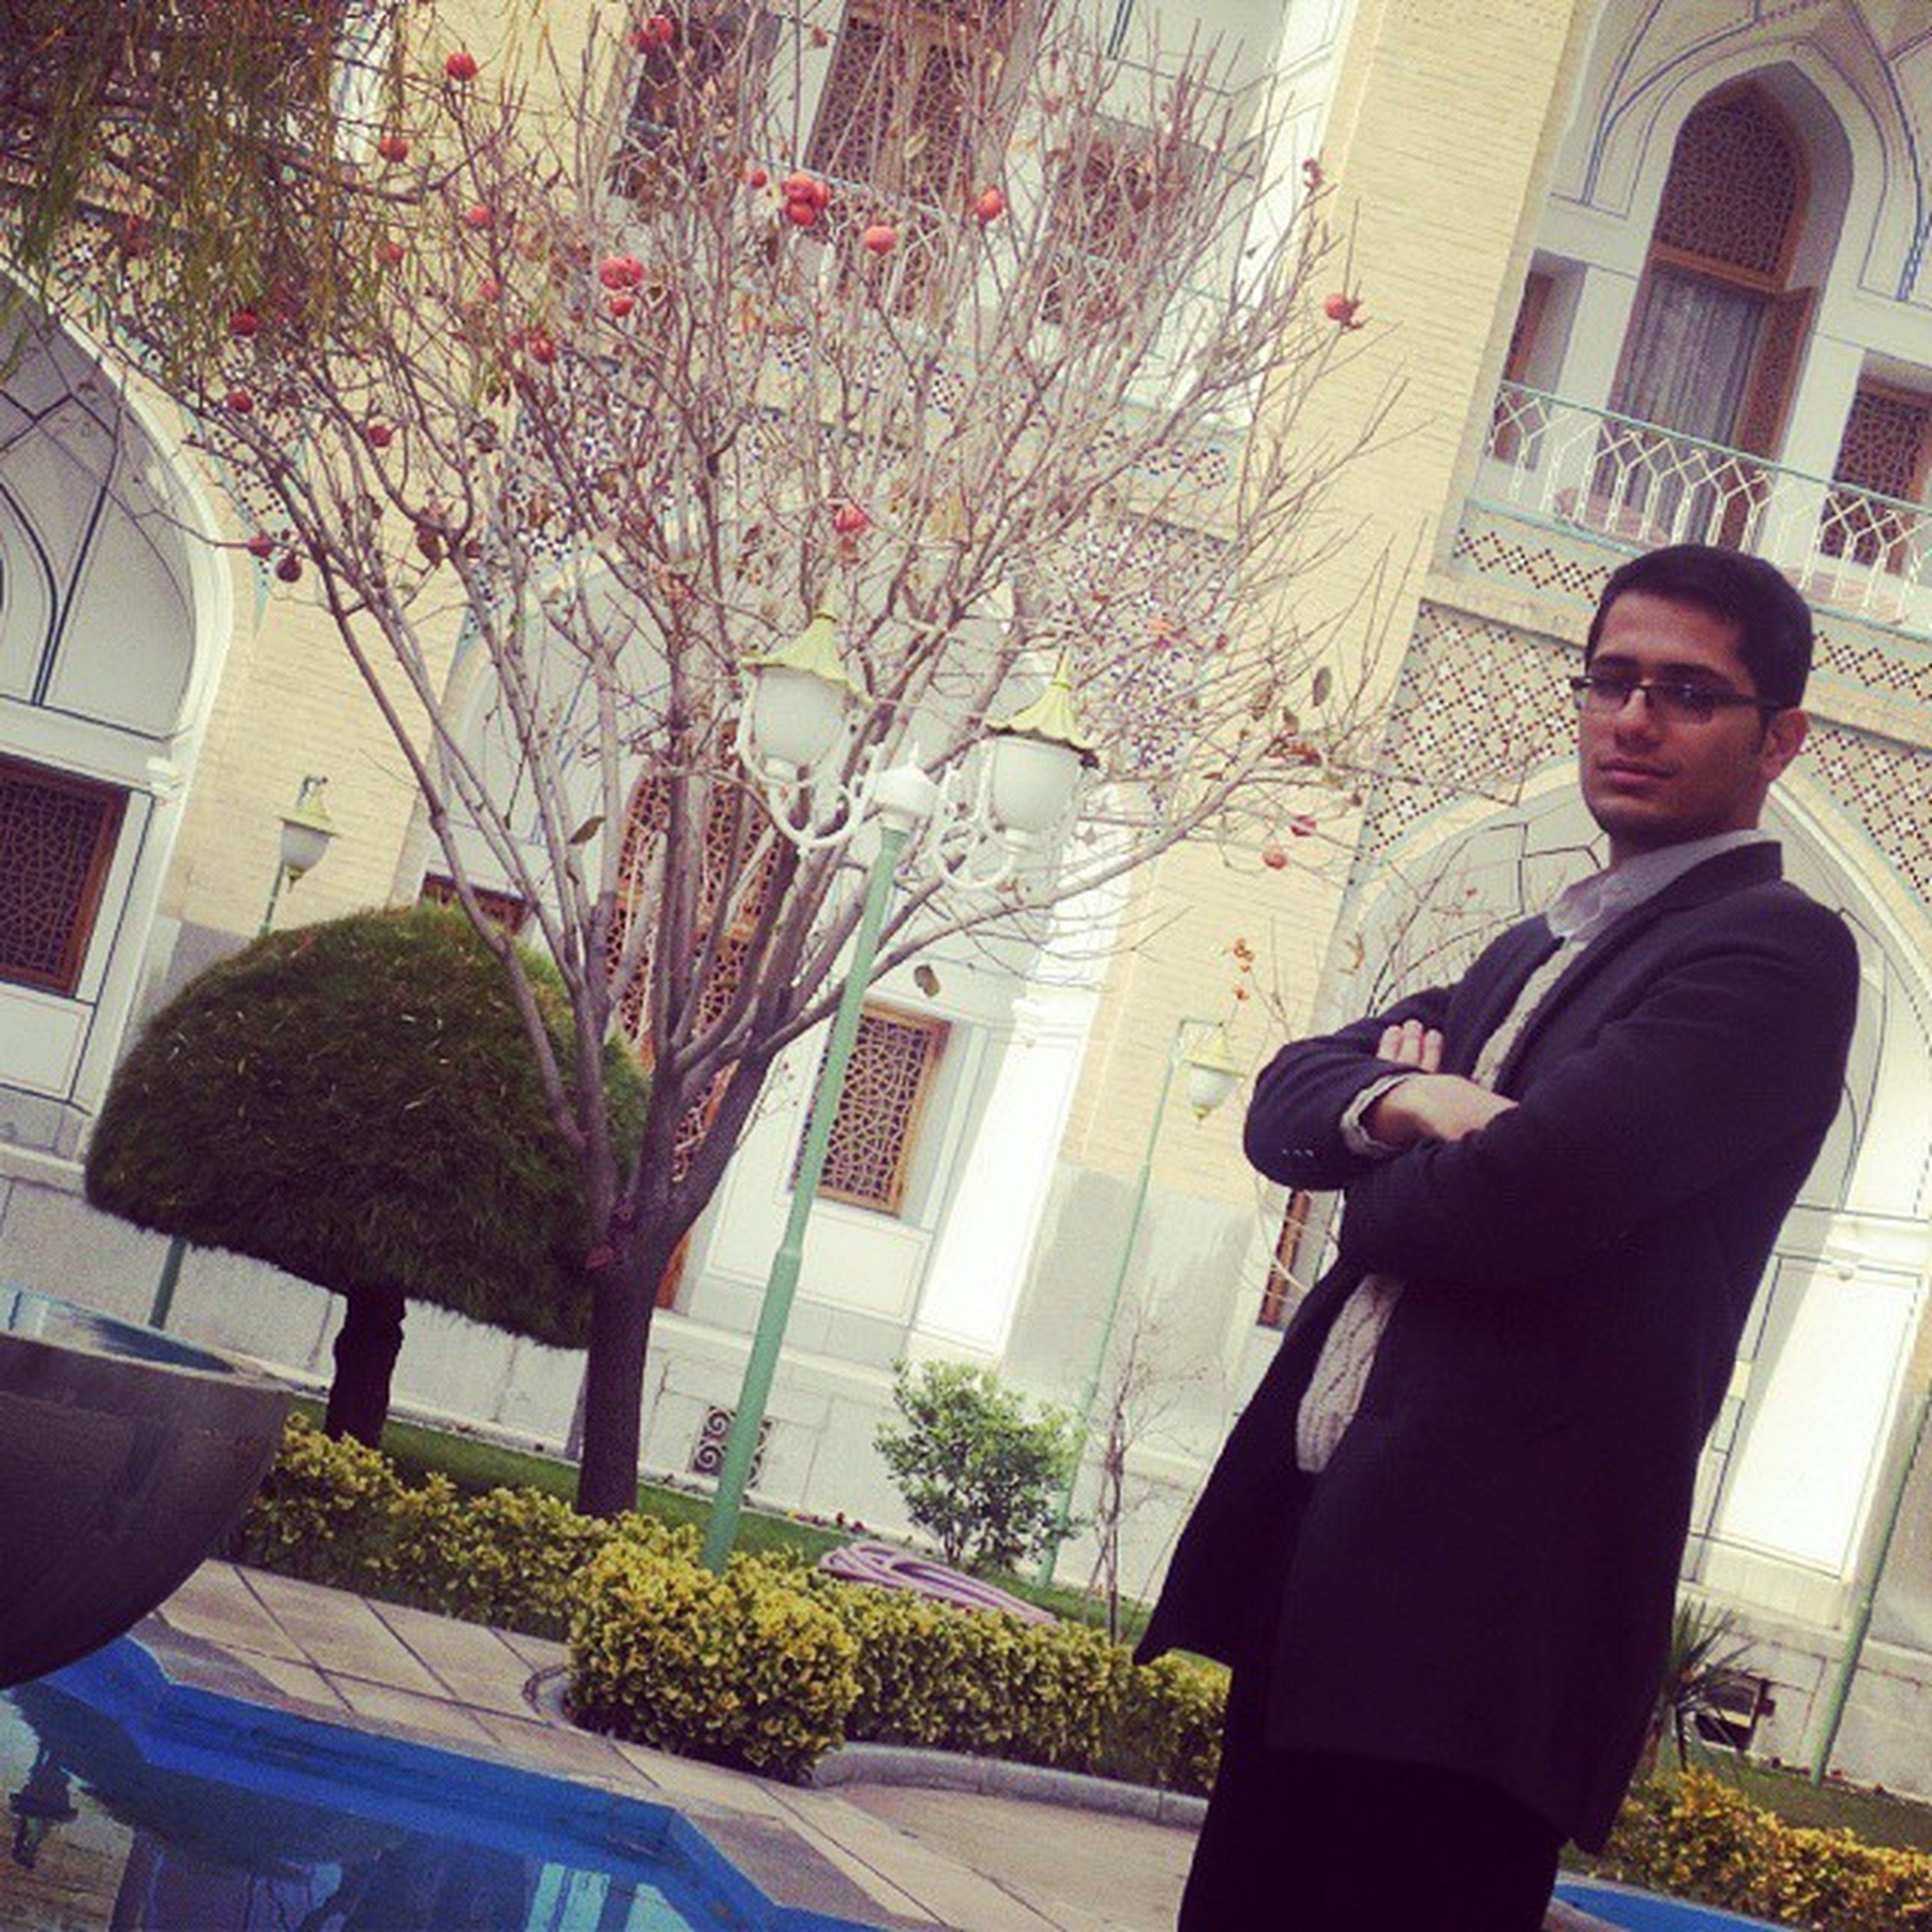 Hotel Abbasi Isfahan Navidkamali اصغهان هتل_عباسی گردشگری نوید_کمالی Nkamali_ir